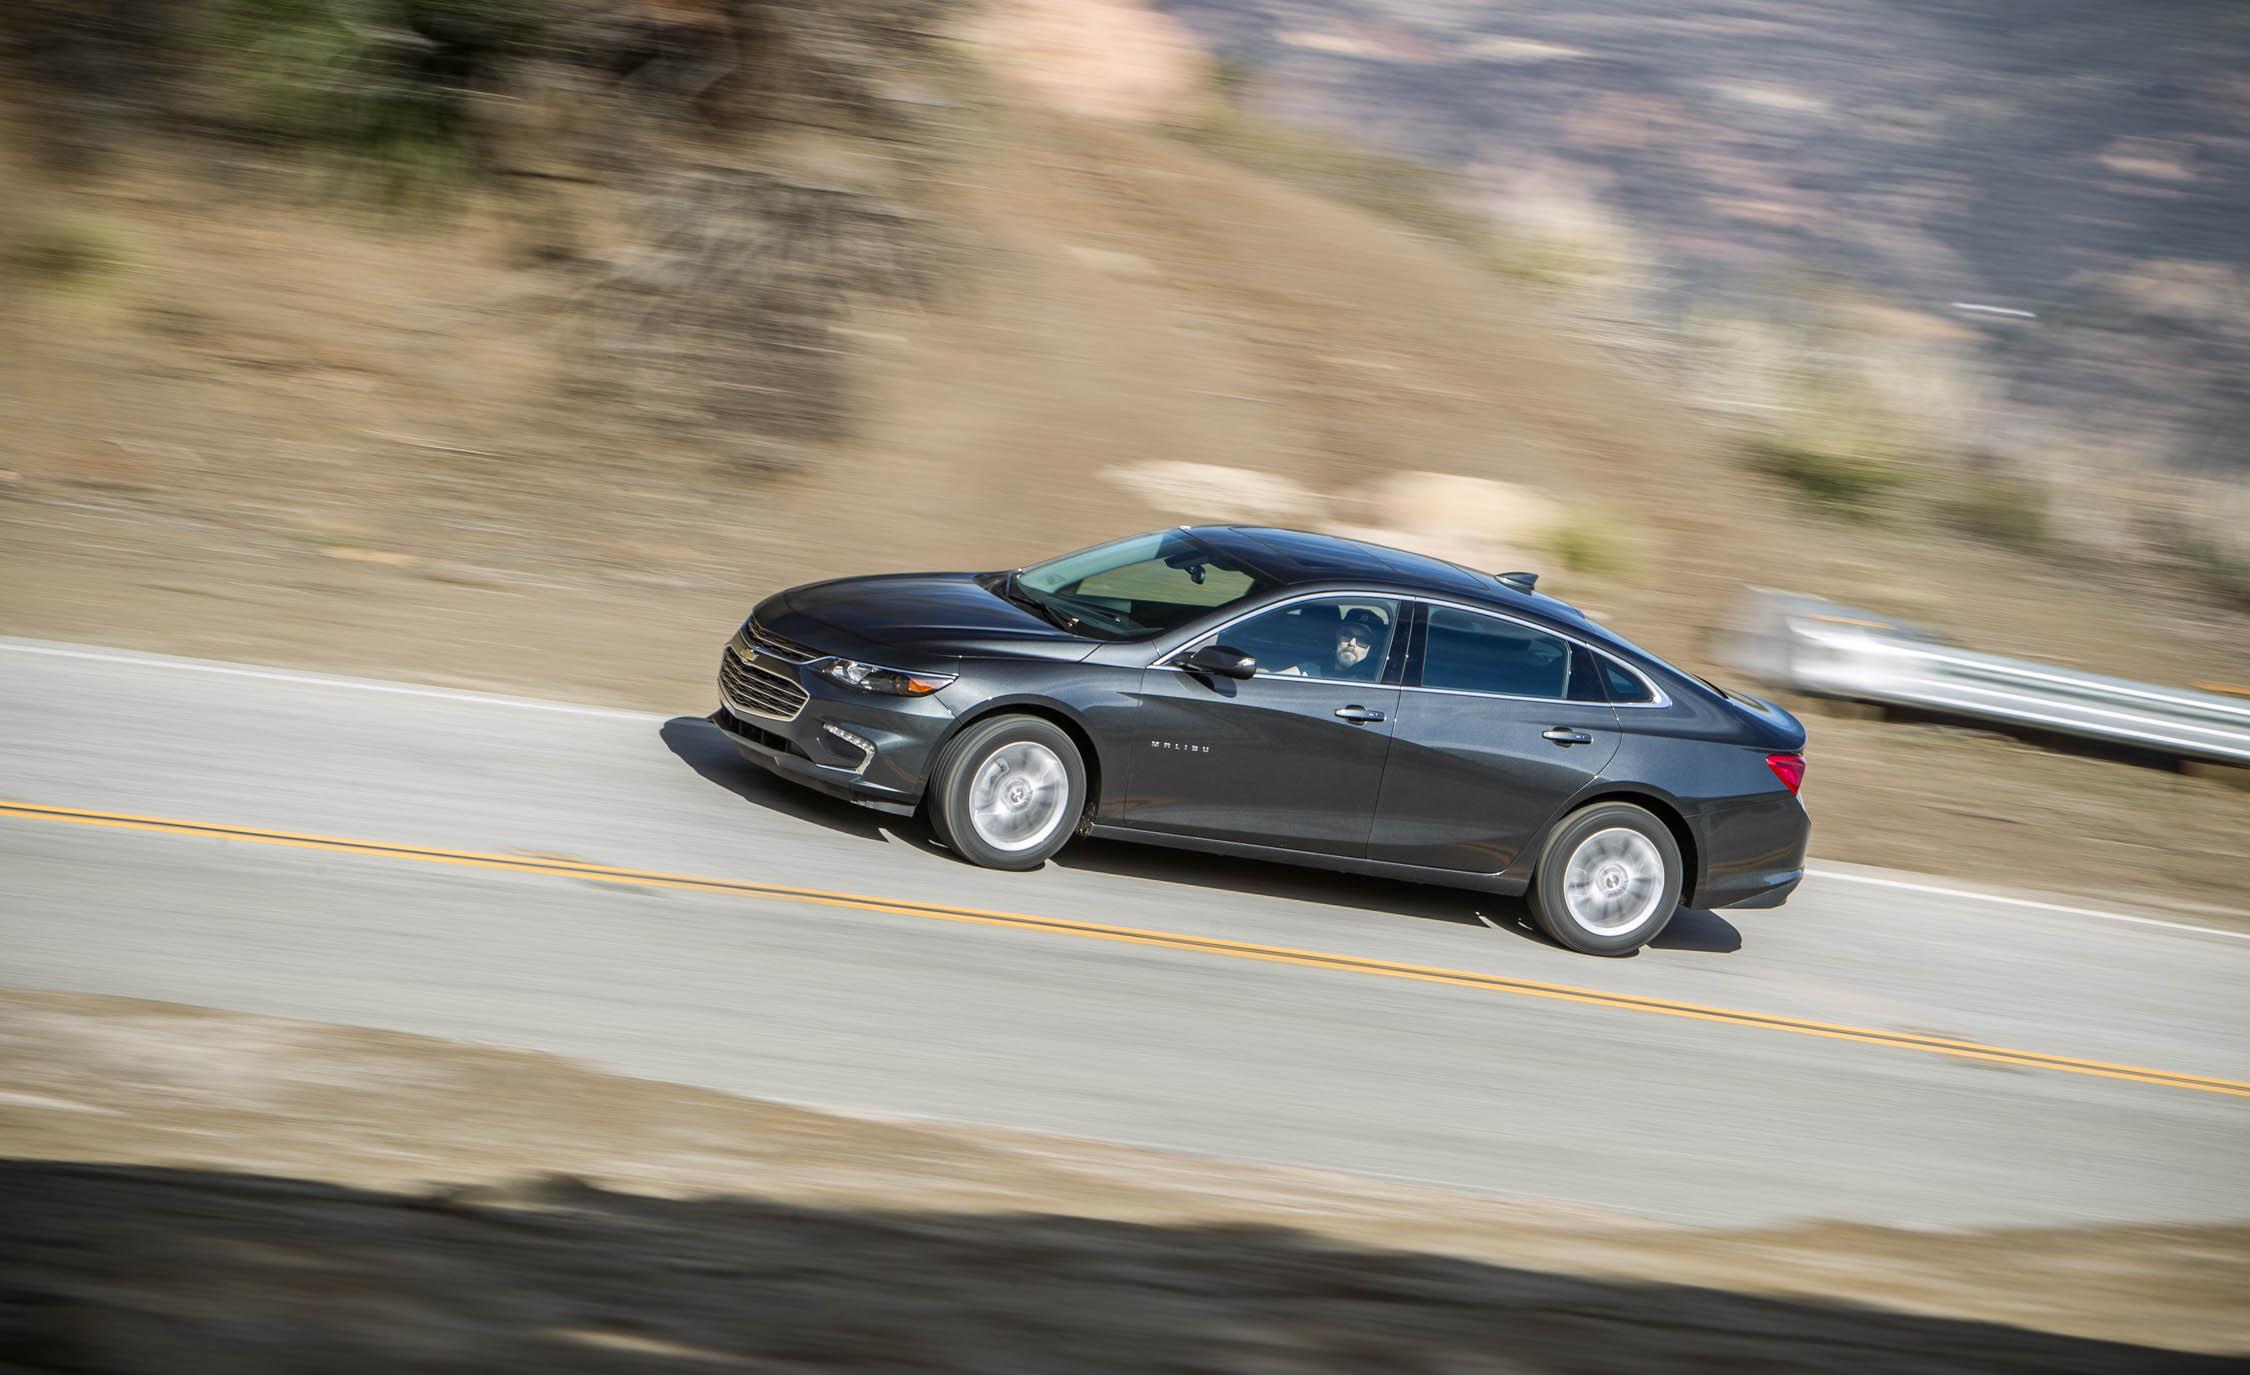 2016 Chevrolet Malibu LT Test Drive